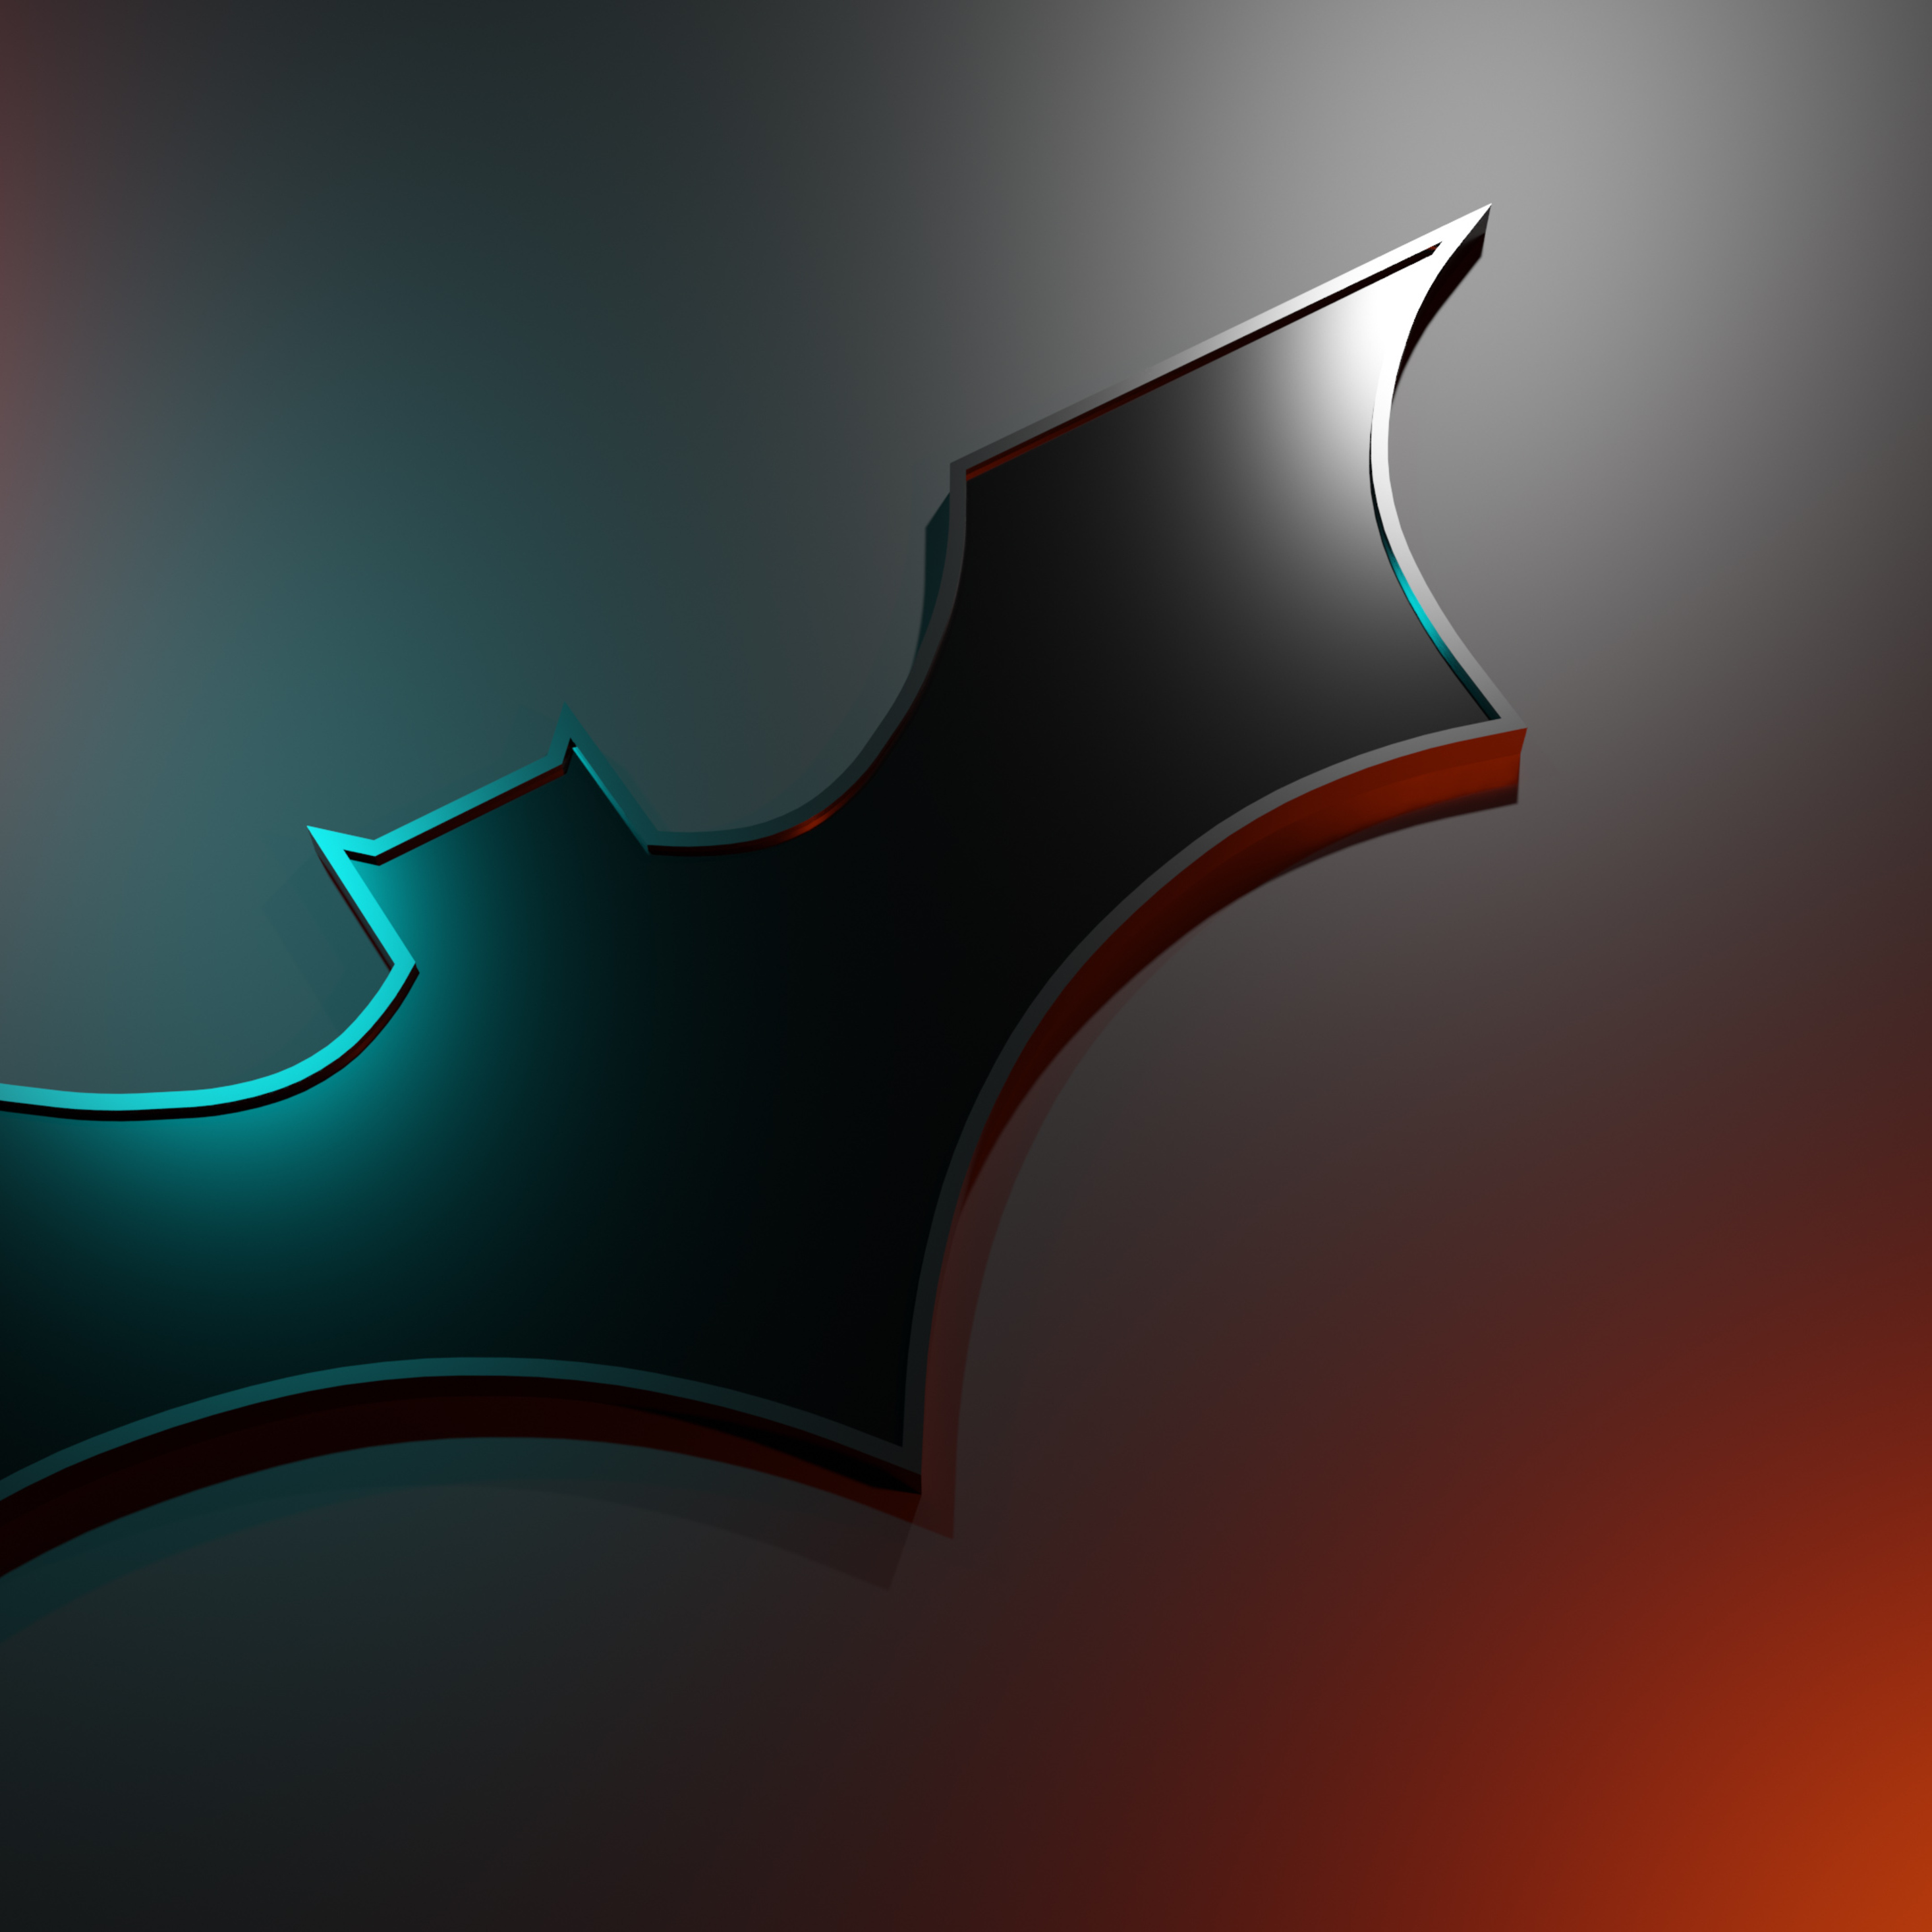 batman-logo-4k-art-os.jpg